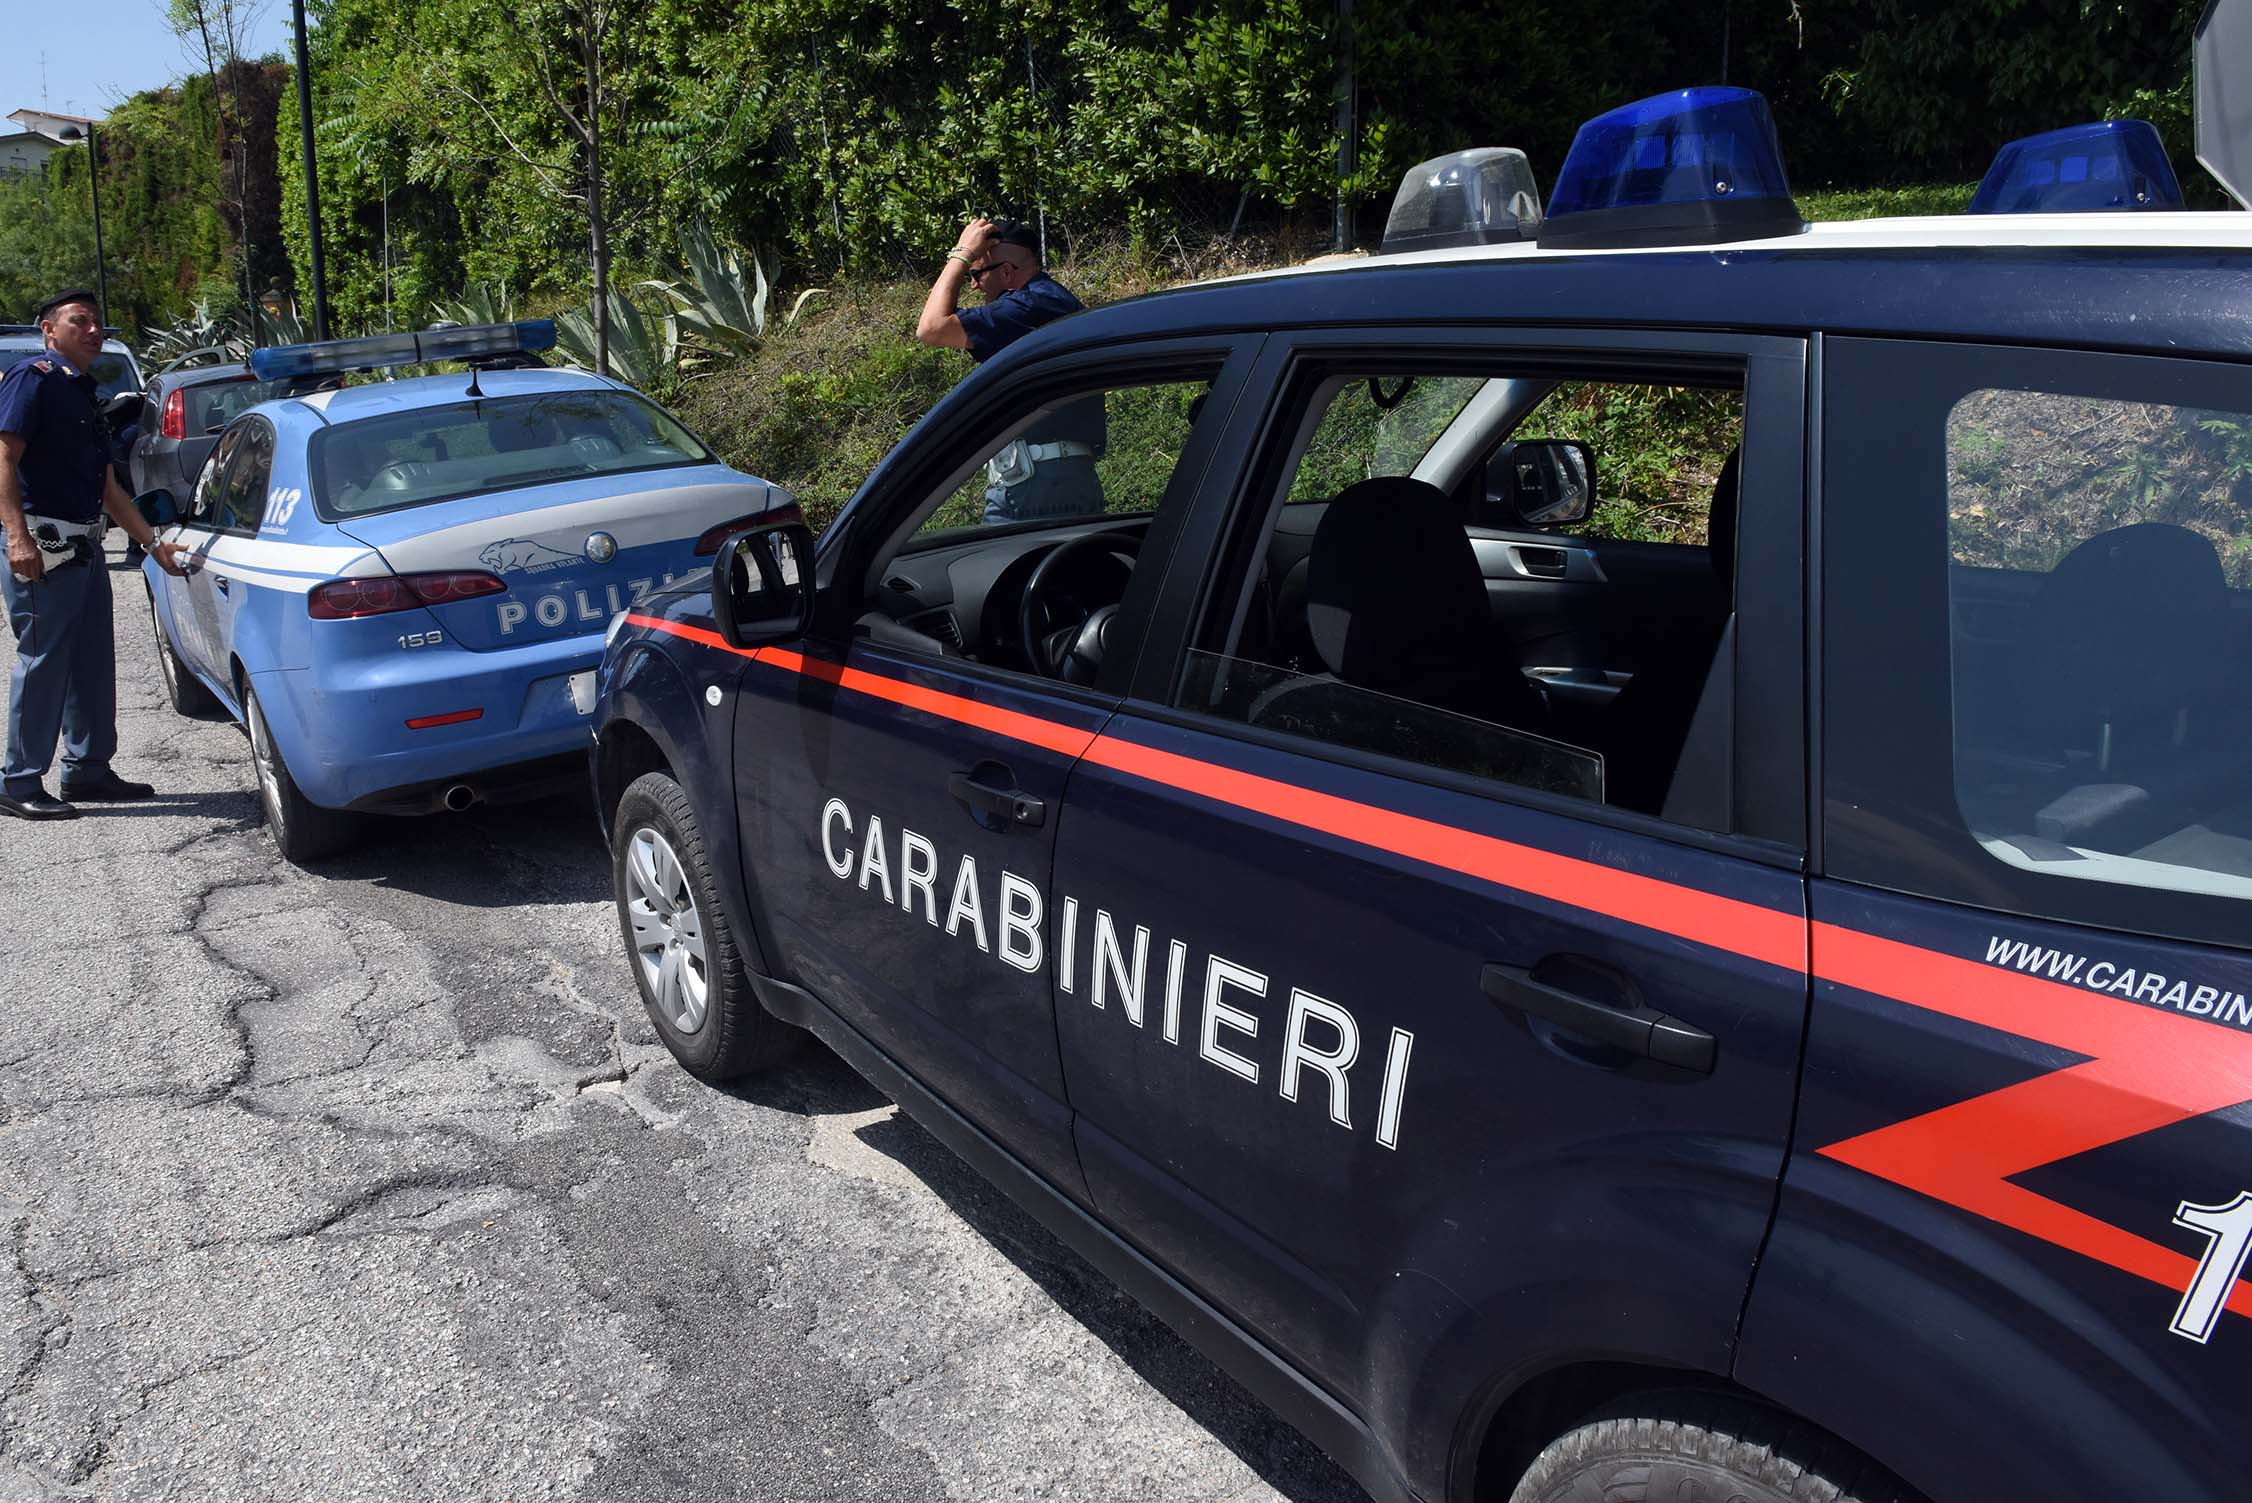 blitz interforze montegranaro sgombero palazzo botticelli carabinieri polizia